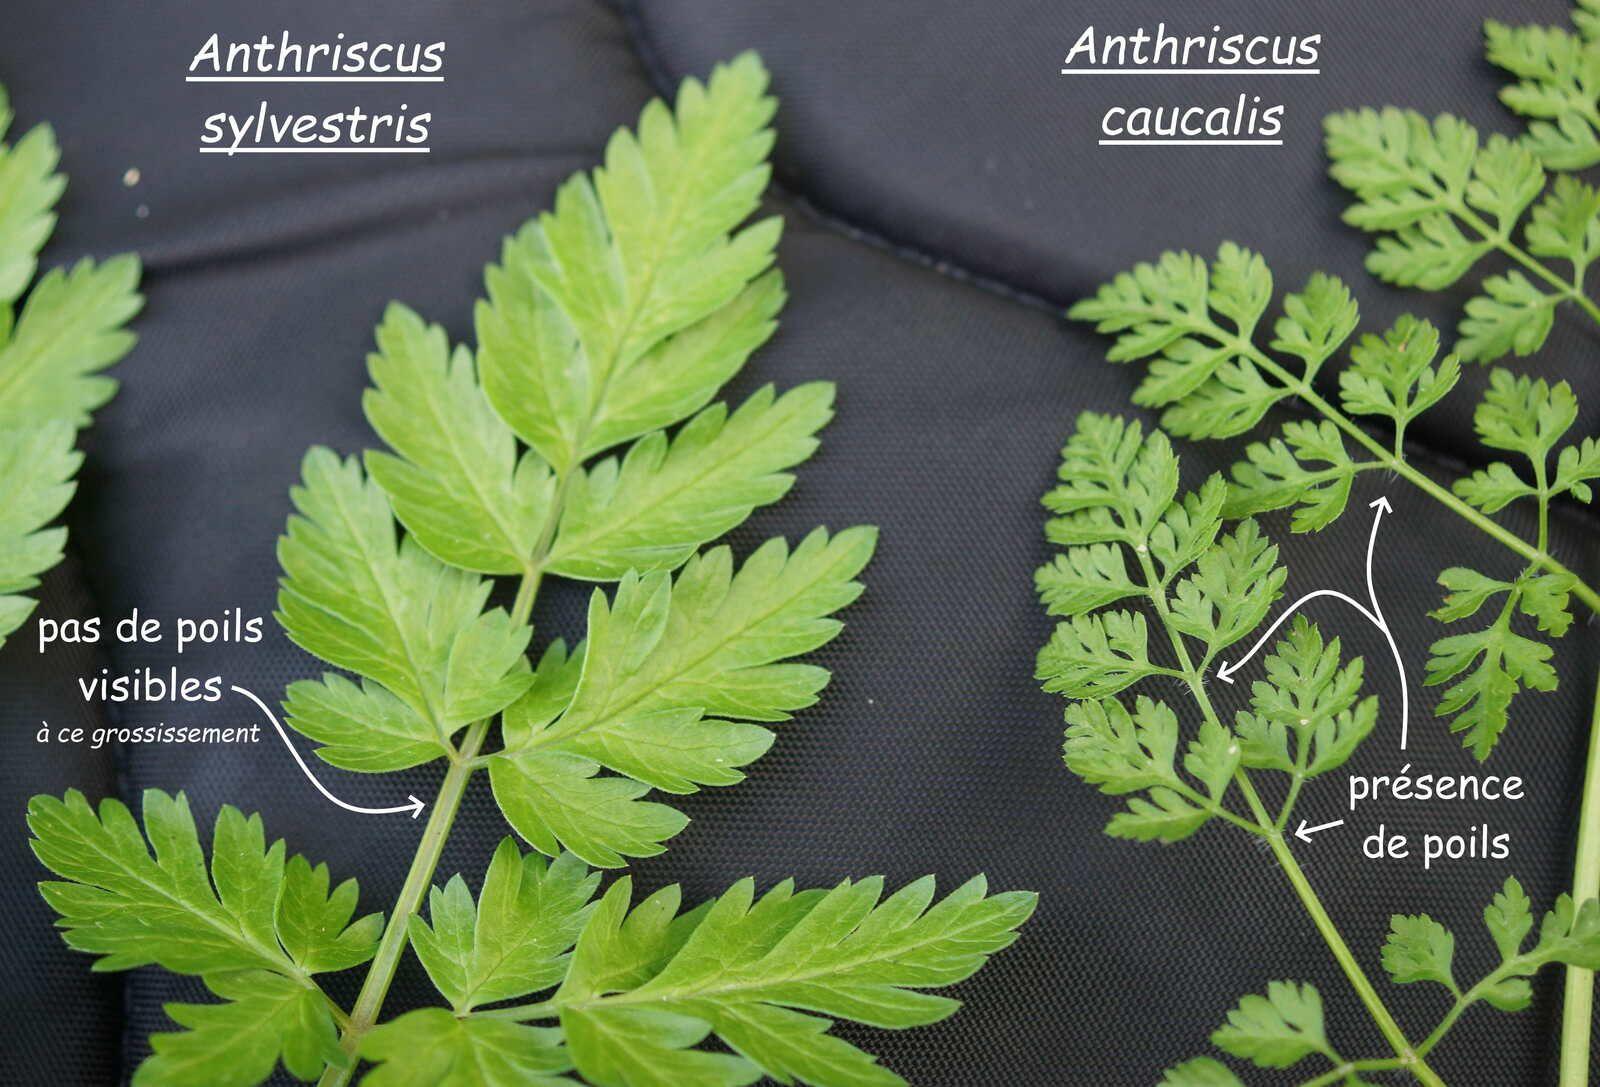 Feuilles d'Anthriscus caucalis et d'Anthriscus sylvestris